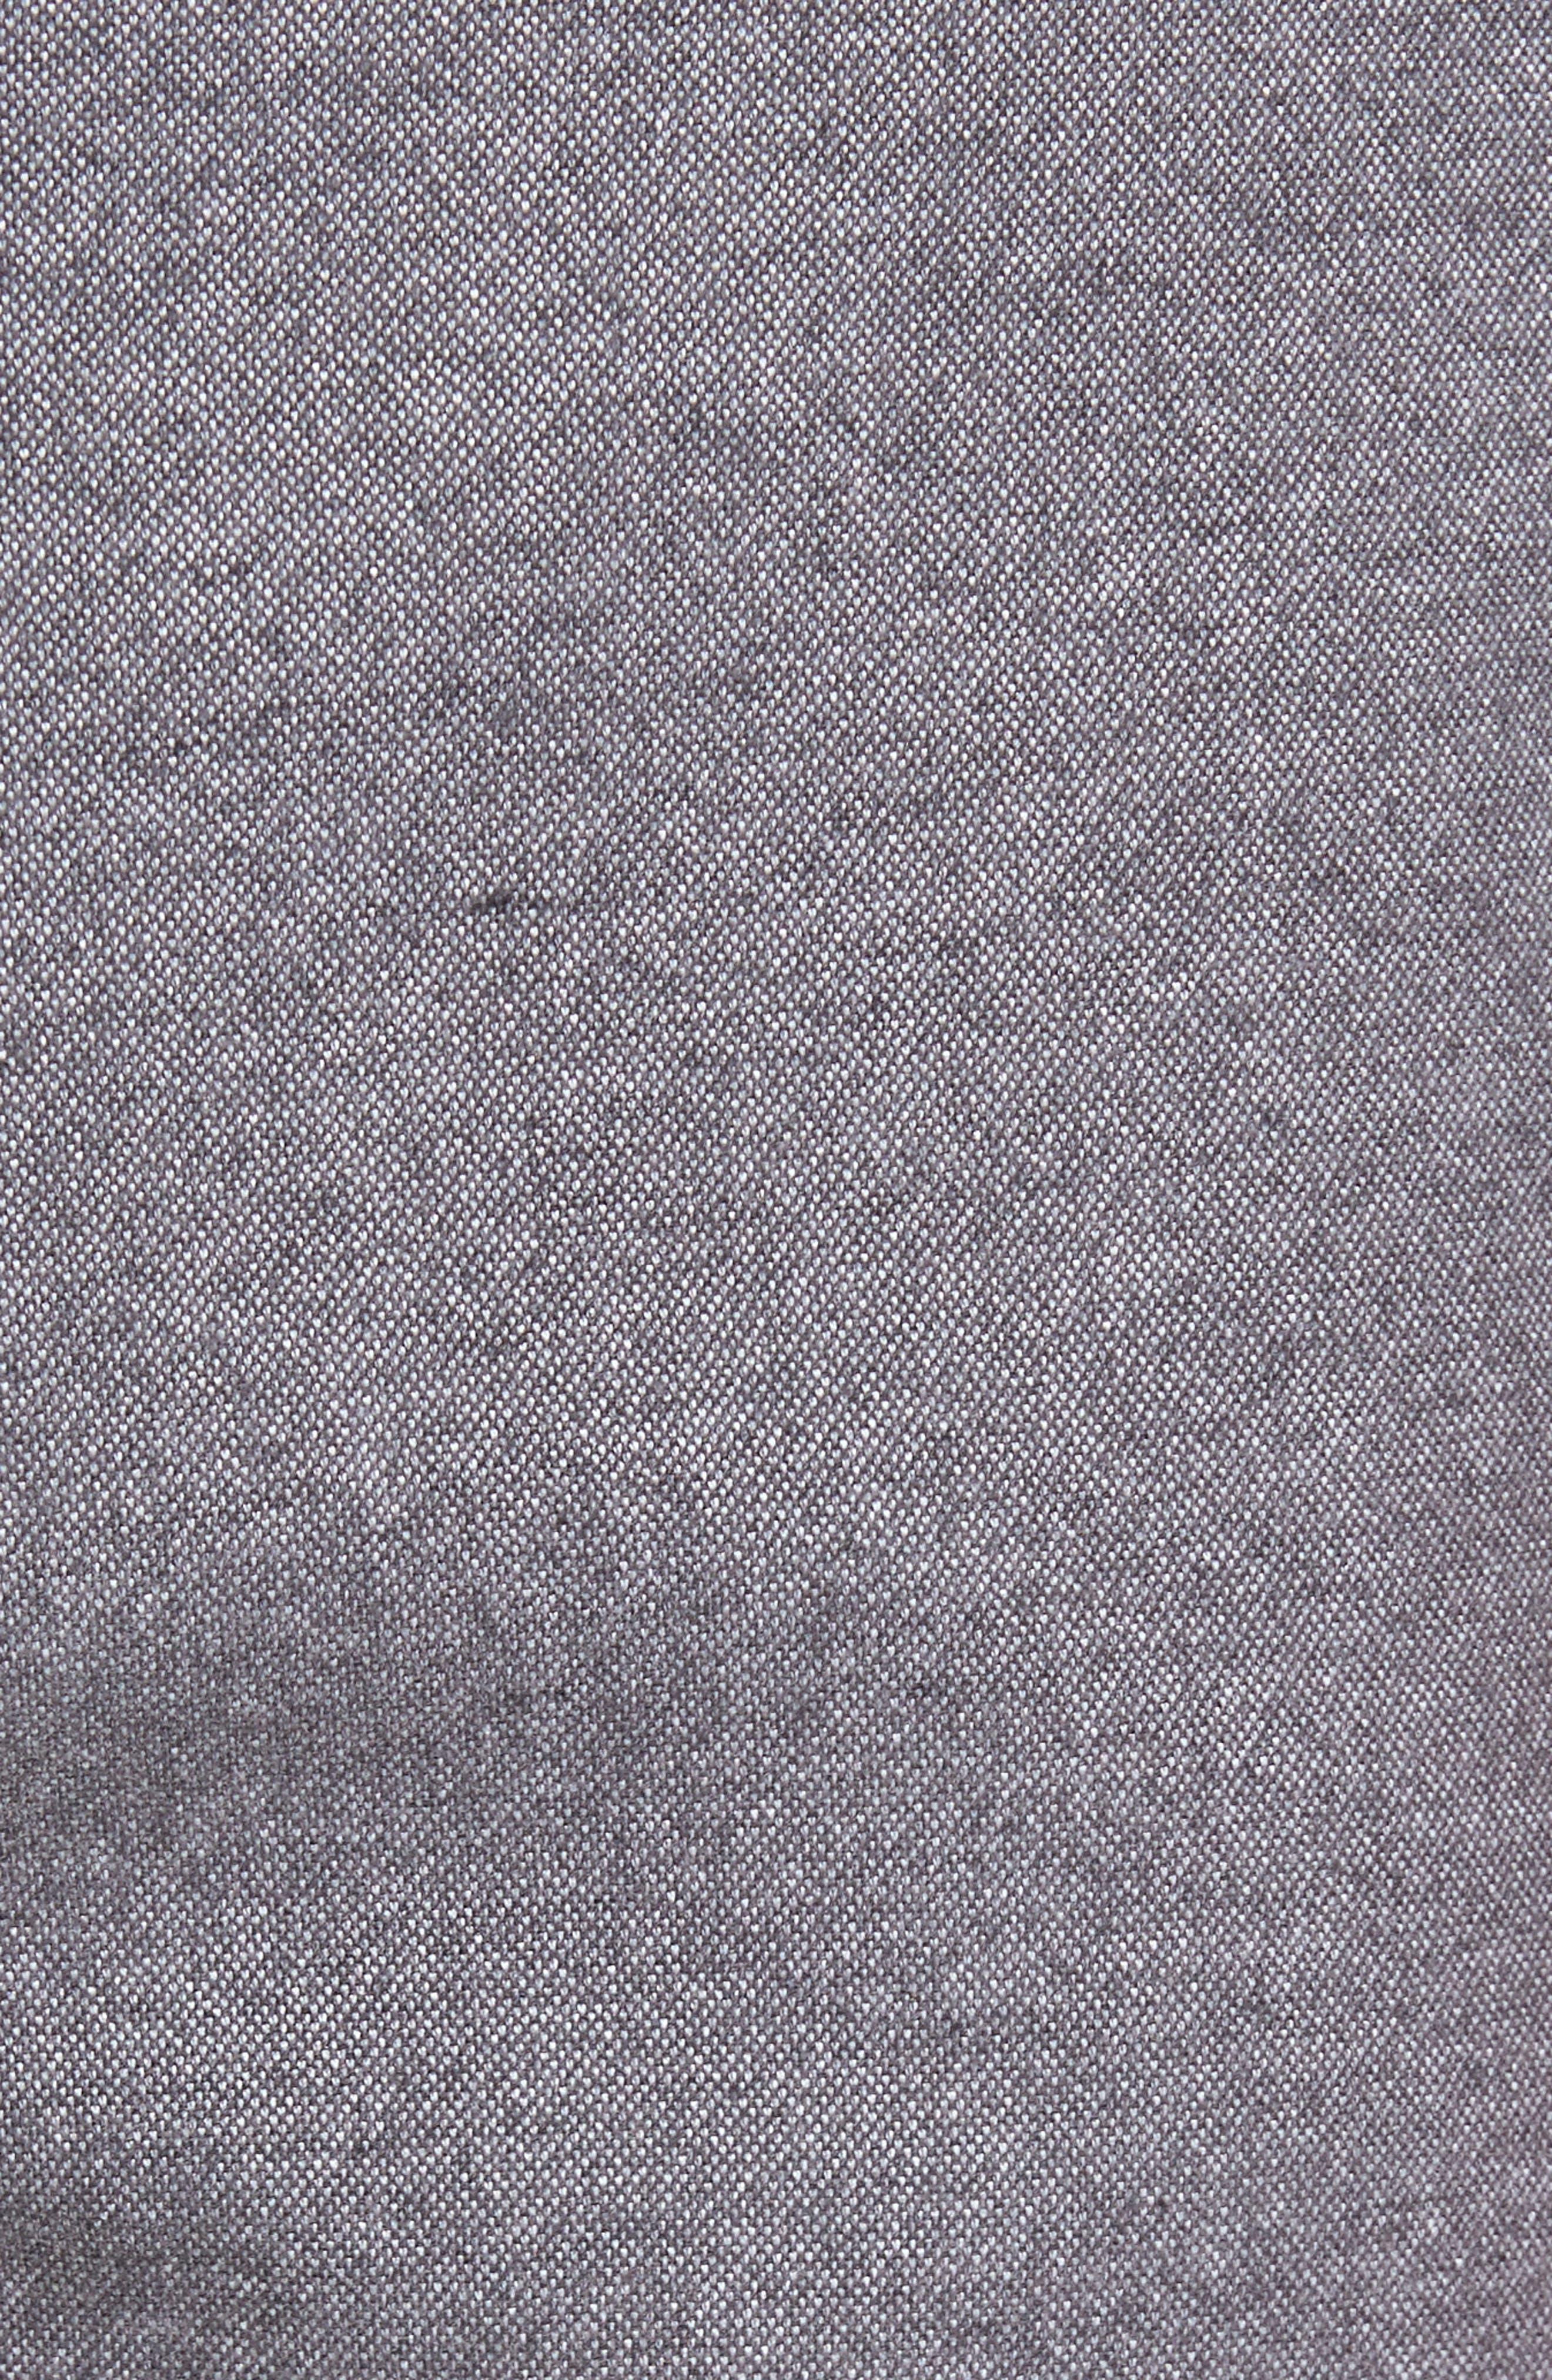 Straight Fit Oxford Burgee Pants,                             Alternate thumbnail 5, color,                             020